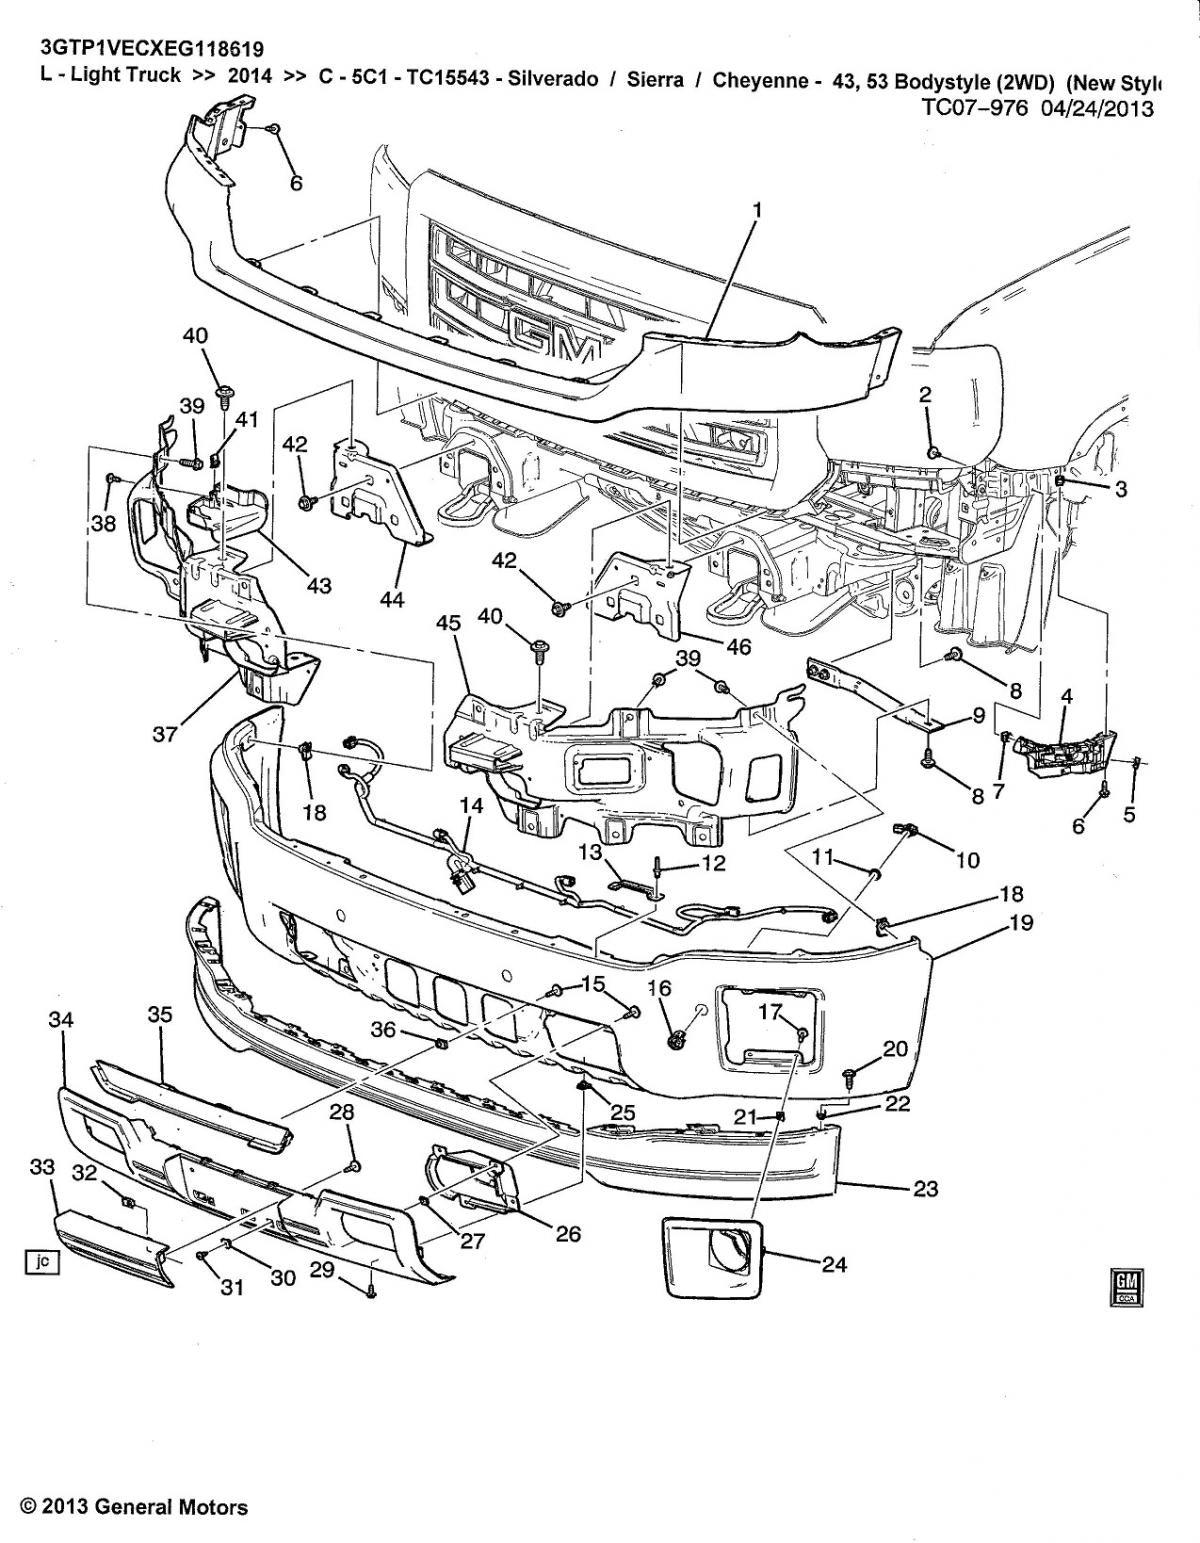 1200x1543 chevy silverado parts diagram post 0 contemporary impression thumb